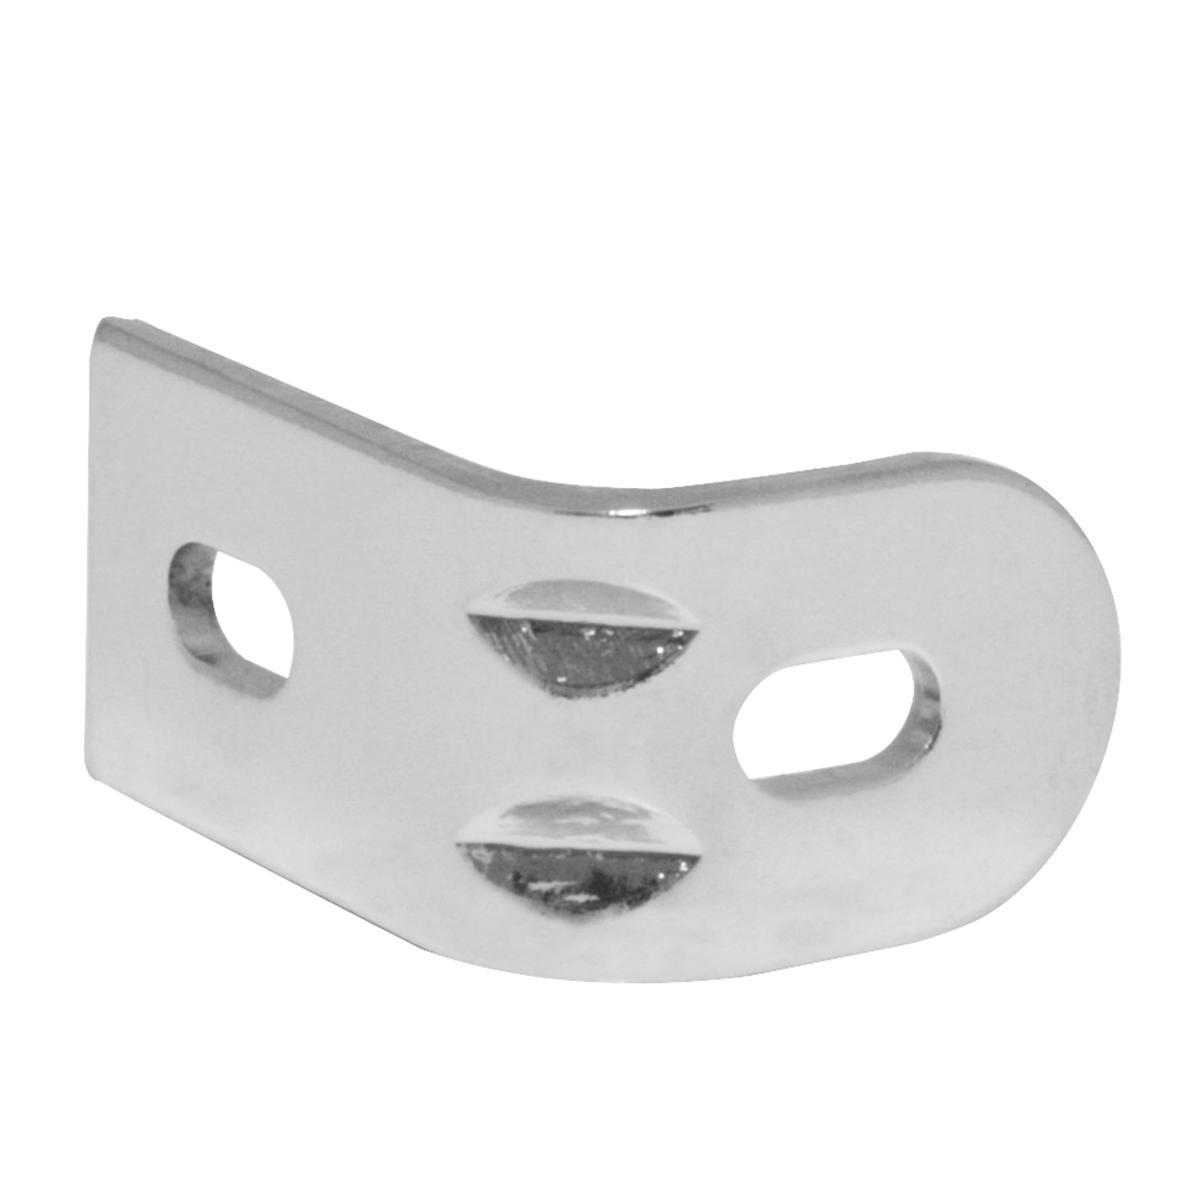 90750 Chrome Bracket for Bug Deflector